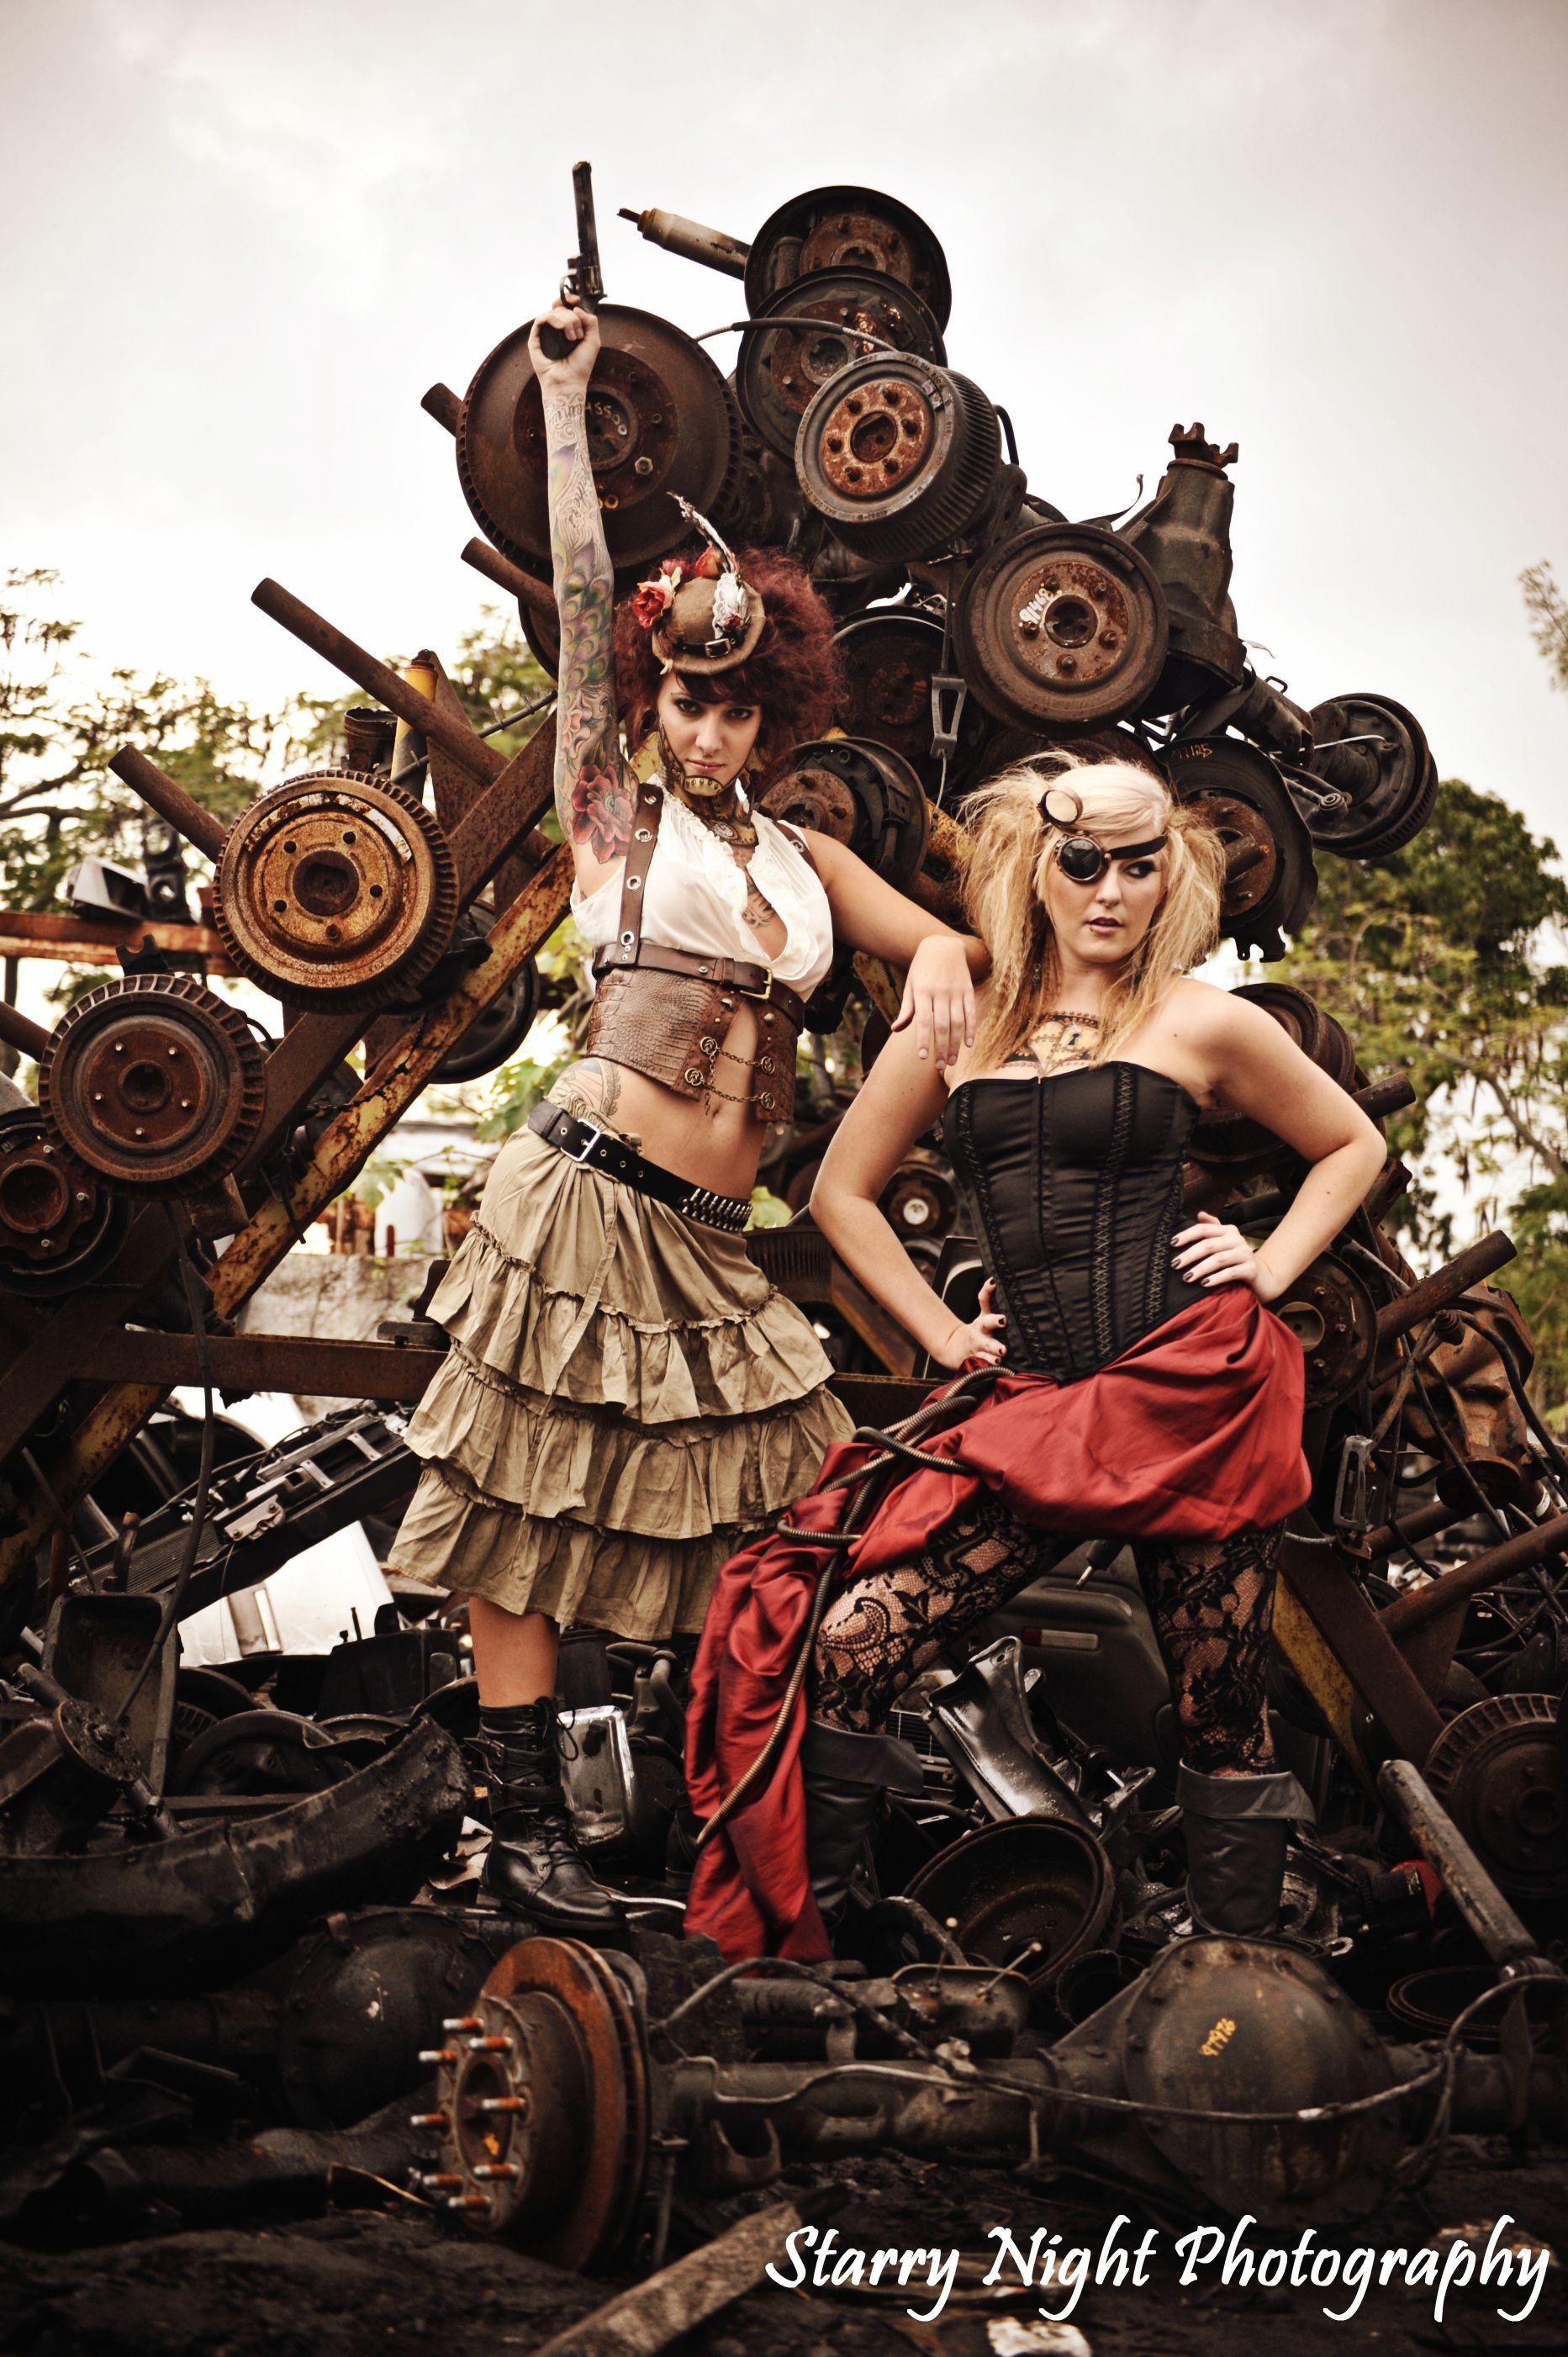 Another awesome junk yard photo junkyard